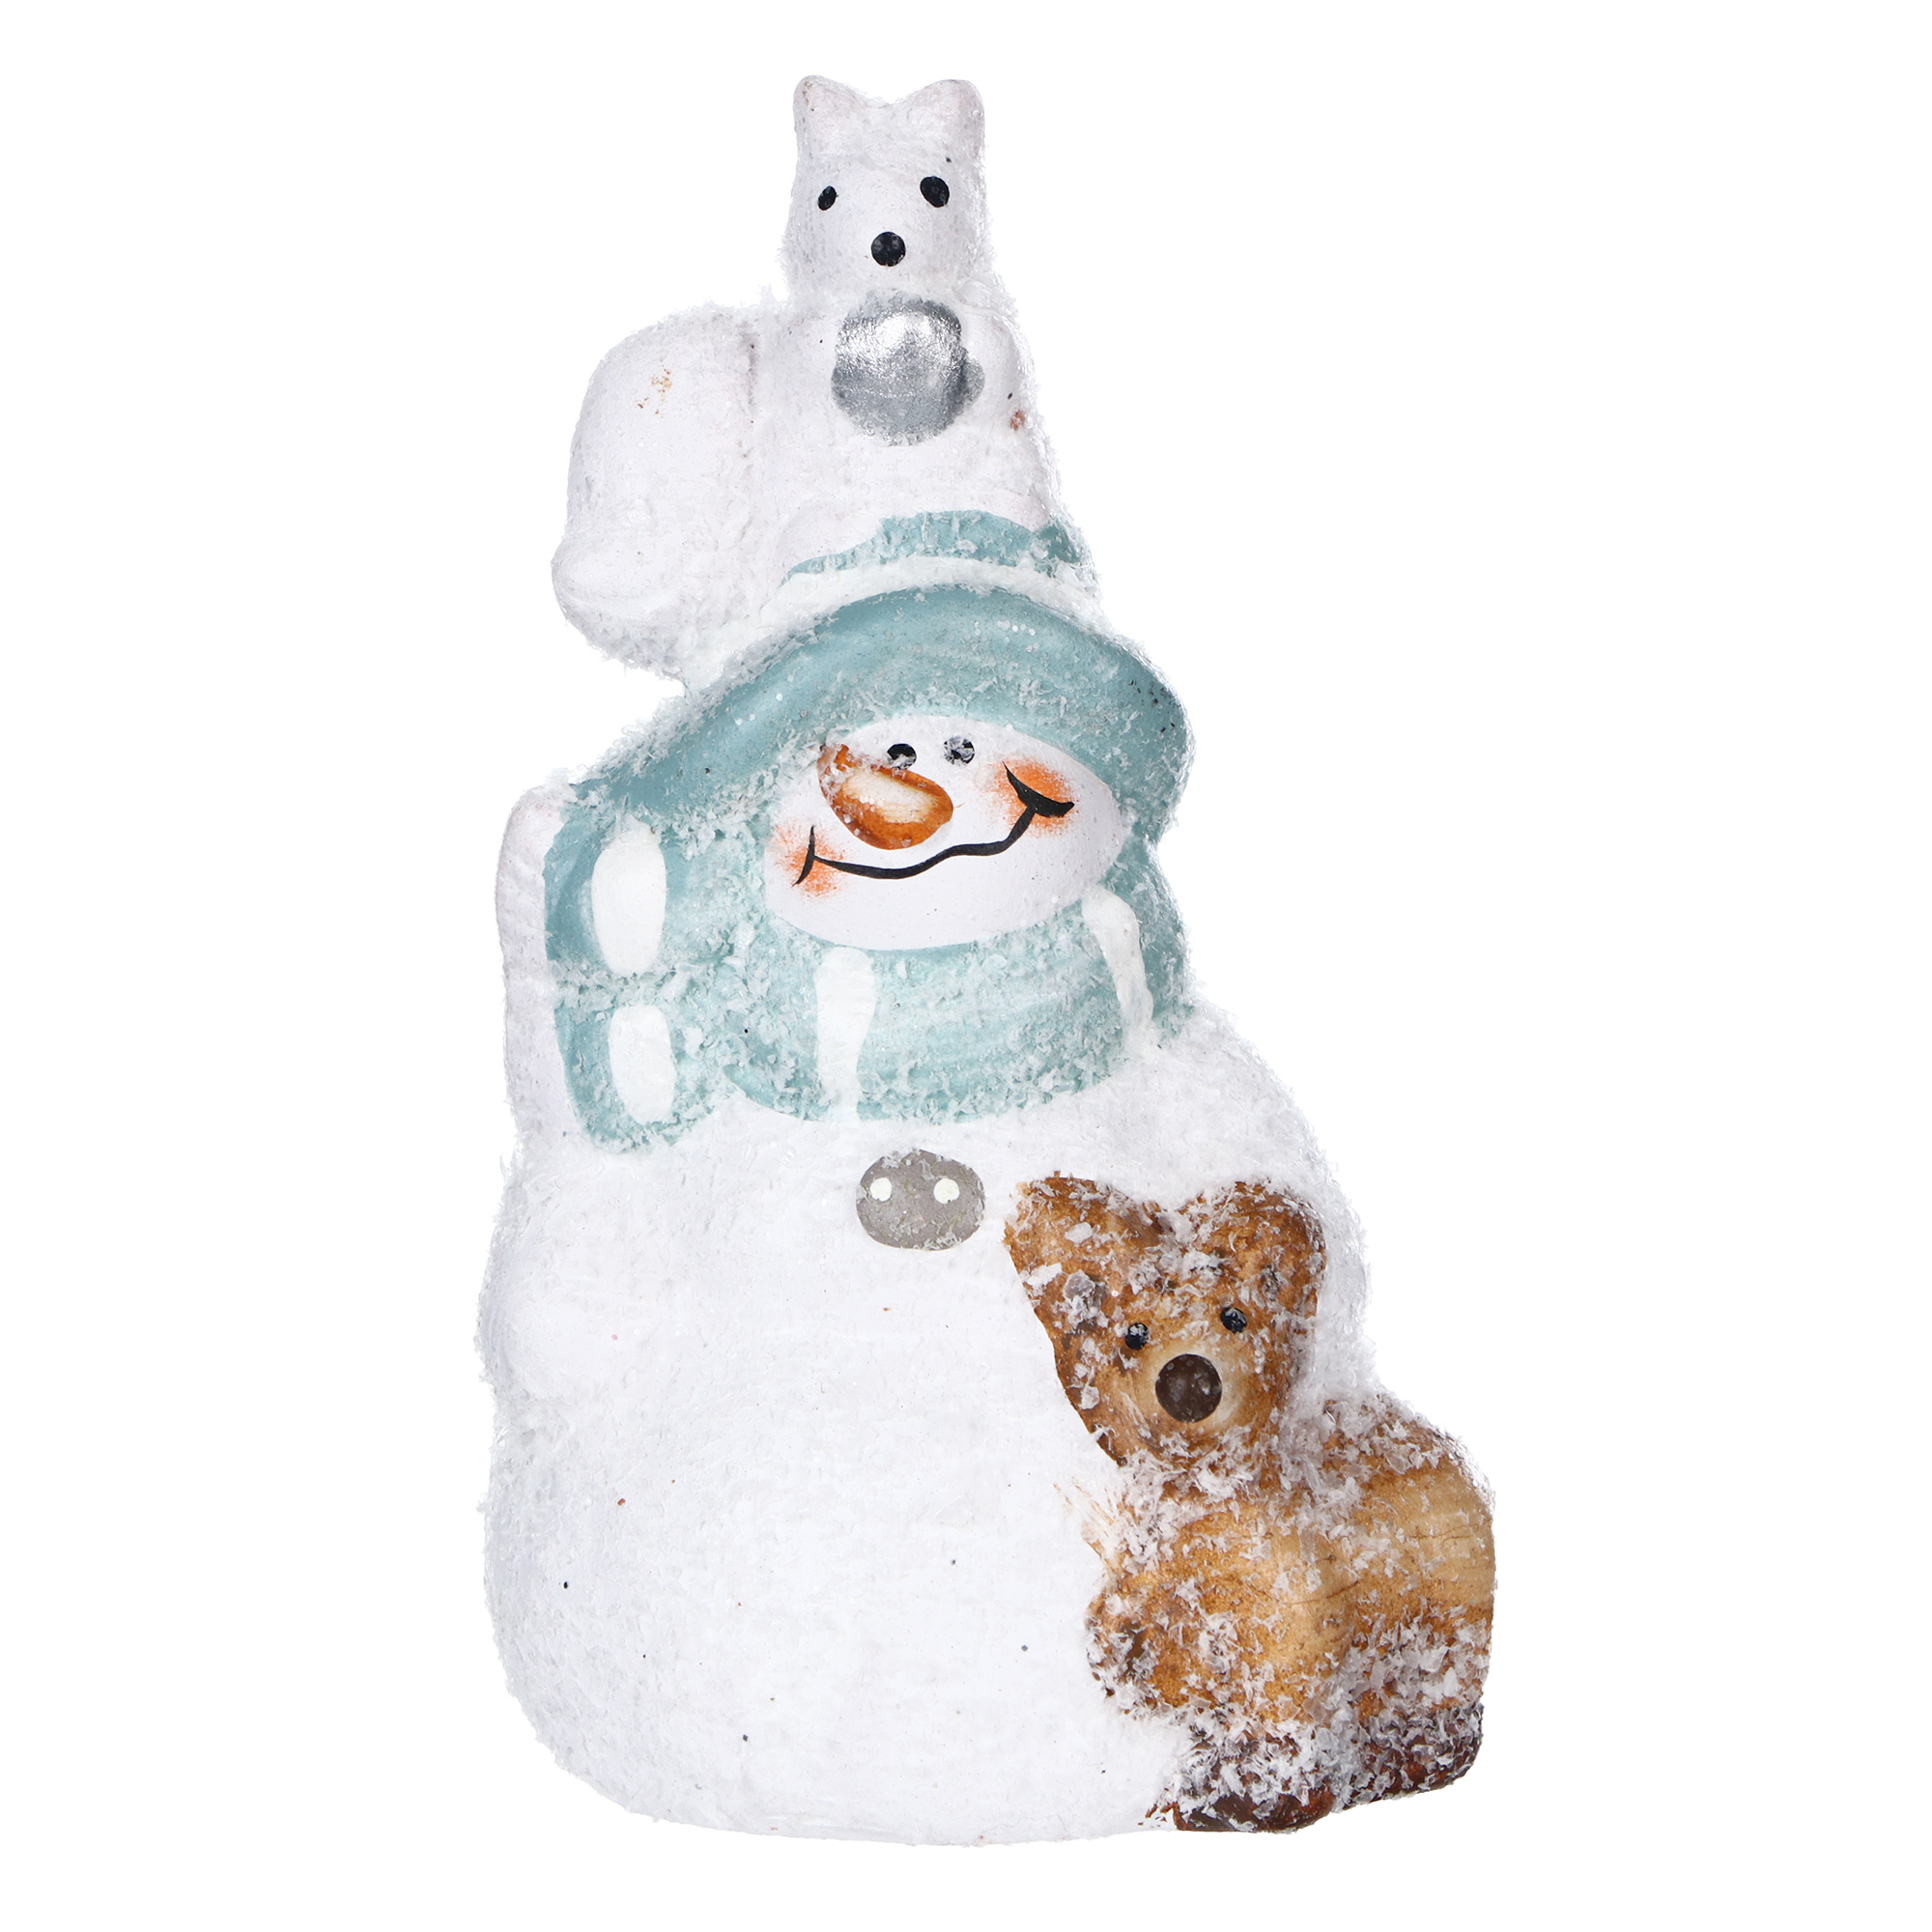 Фигурка Kaemingk Снеговик 12 см фигурка lefard снеговик 787 179